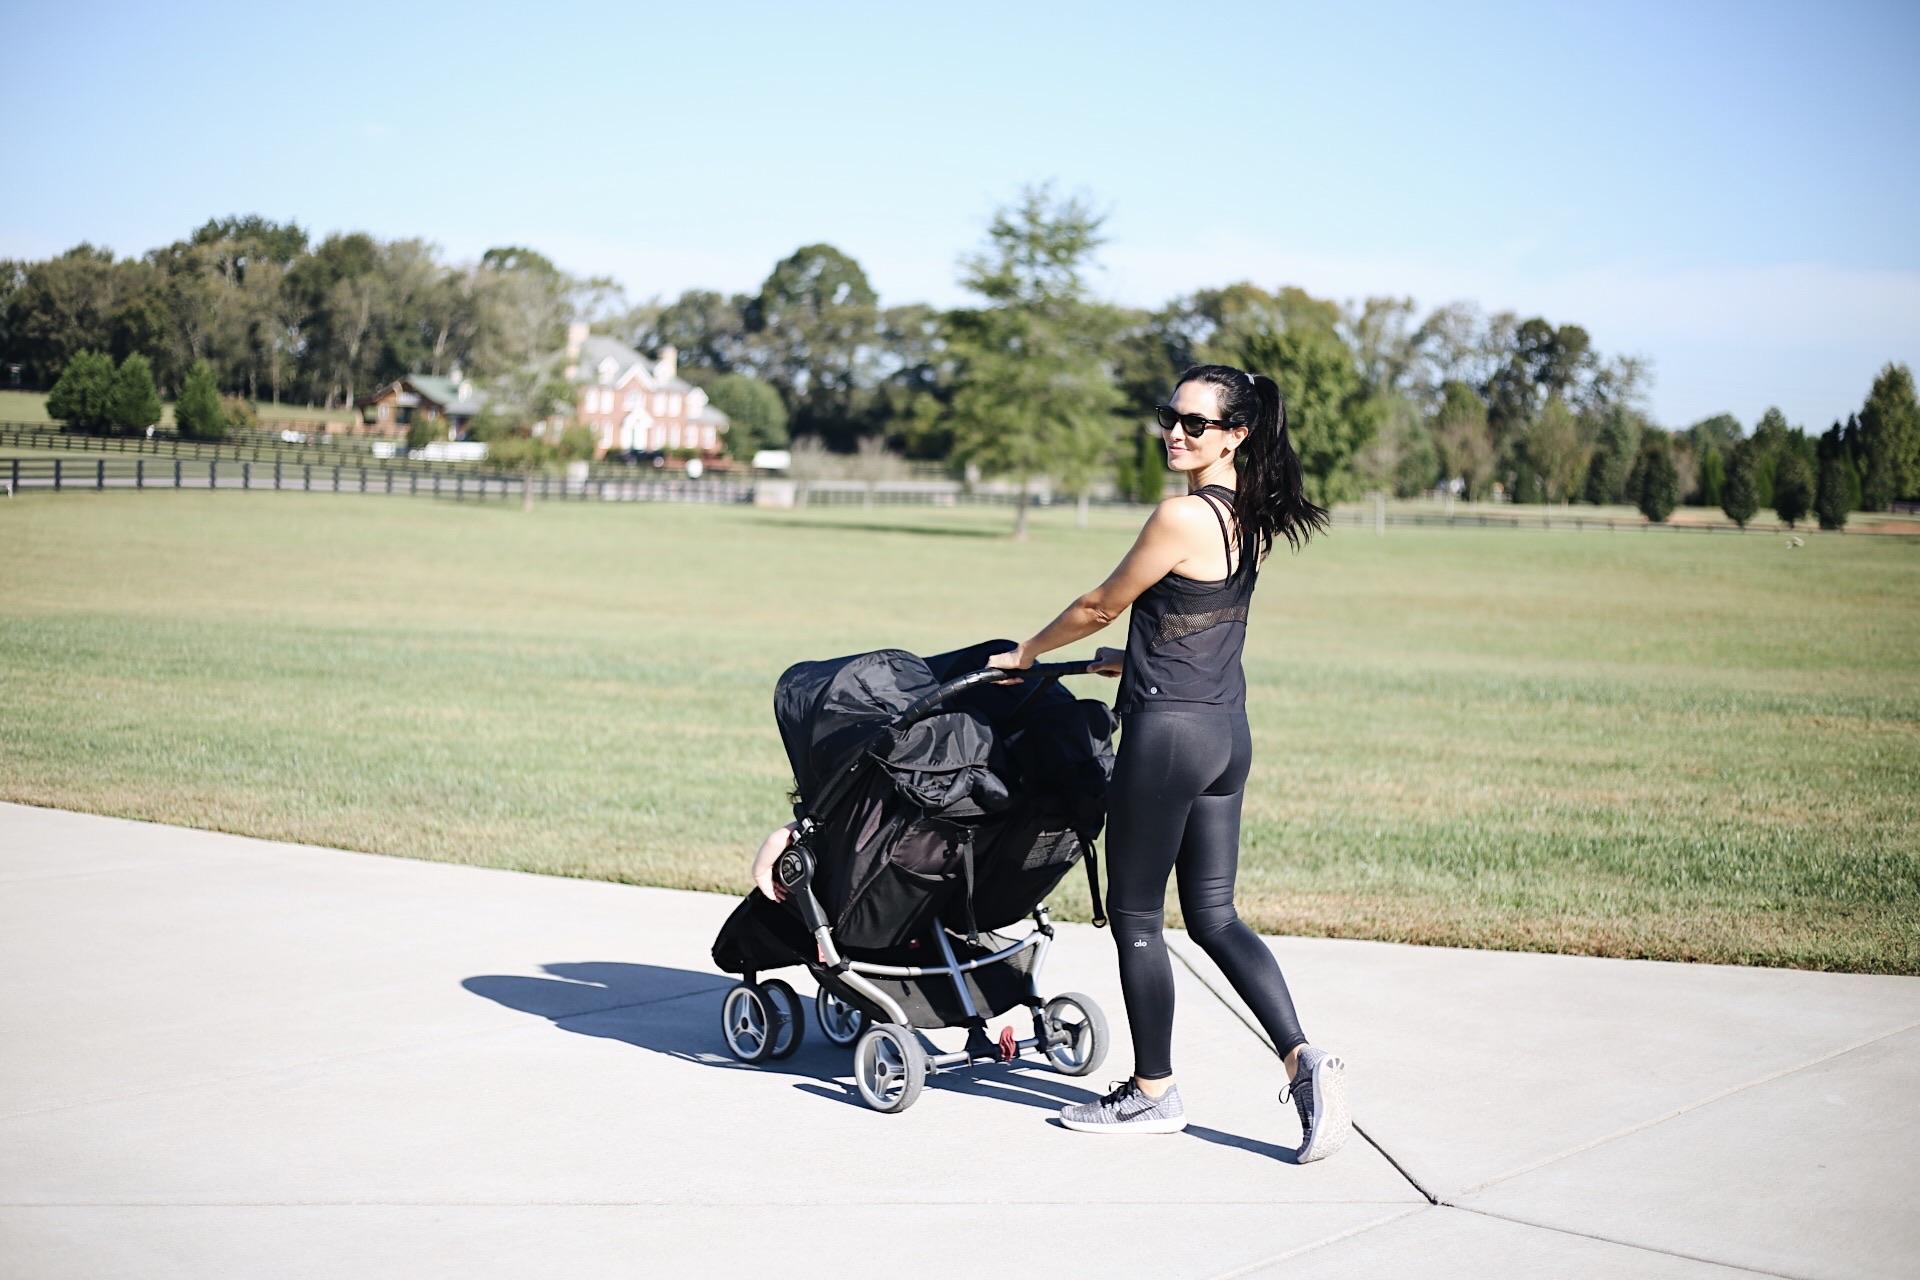    double stroller     Alo leggings     tank (similar)     Nike sneakers     sunnies    image:sydney clawson  